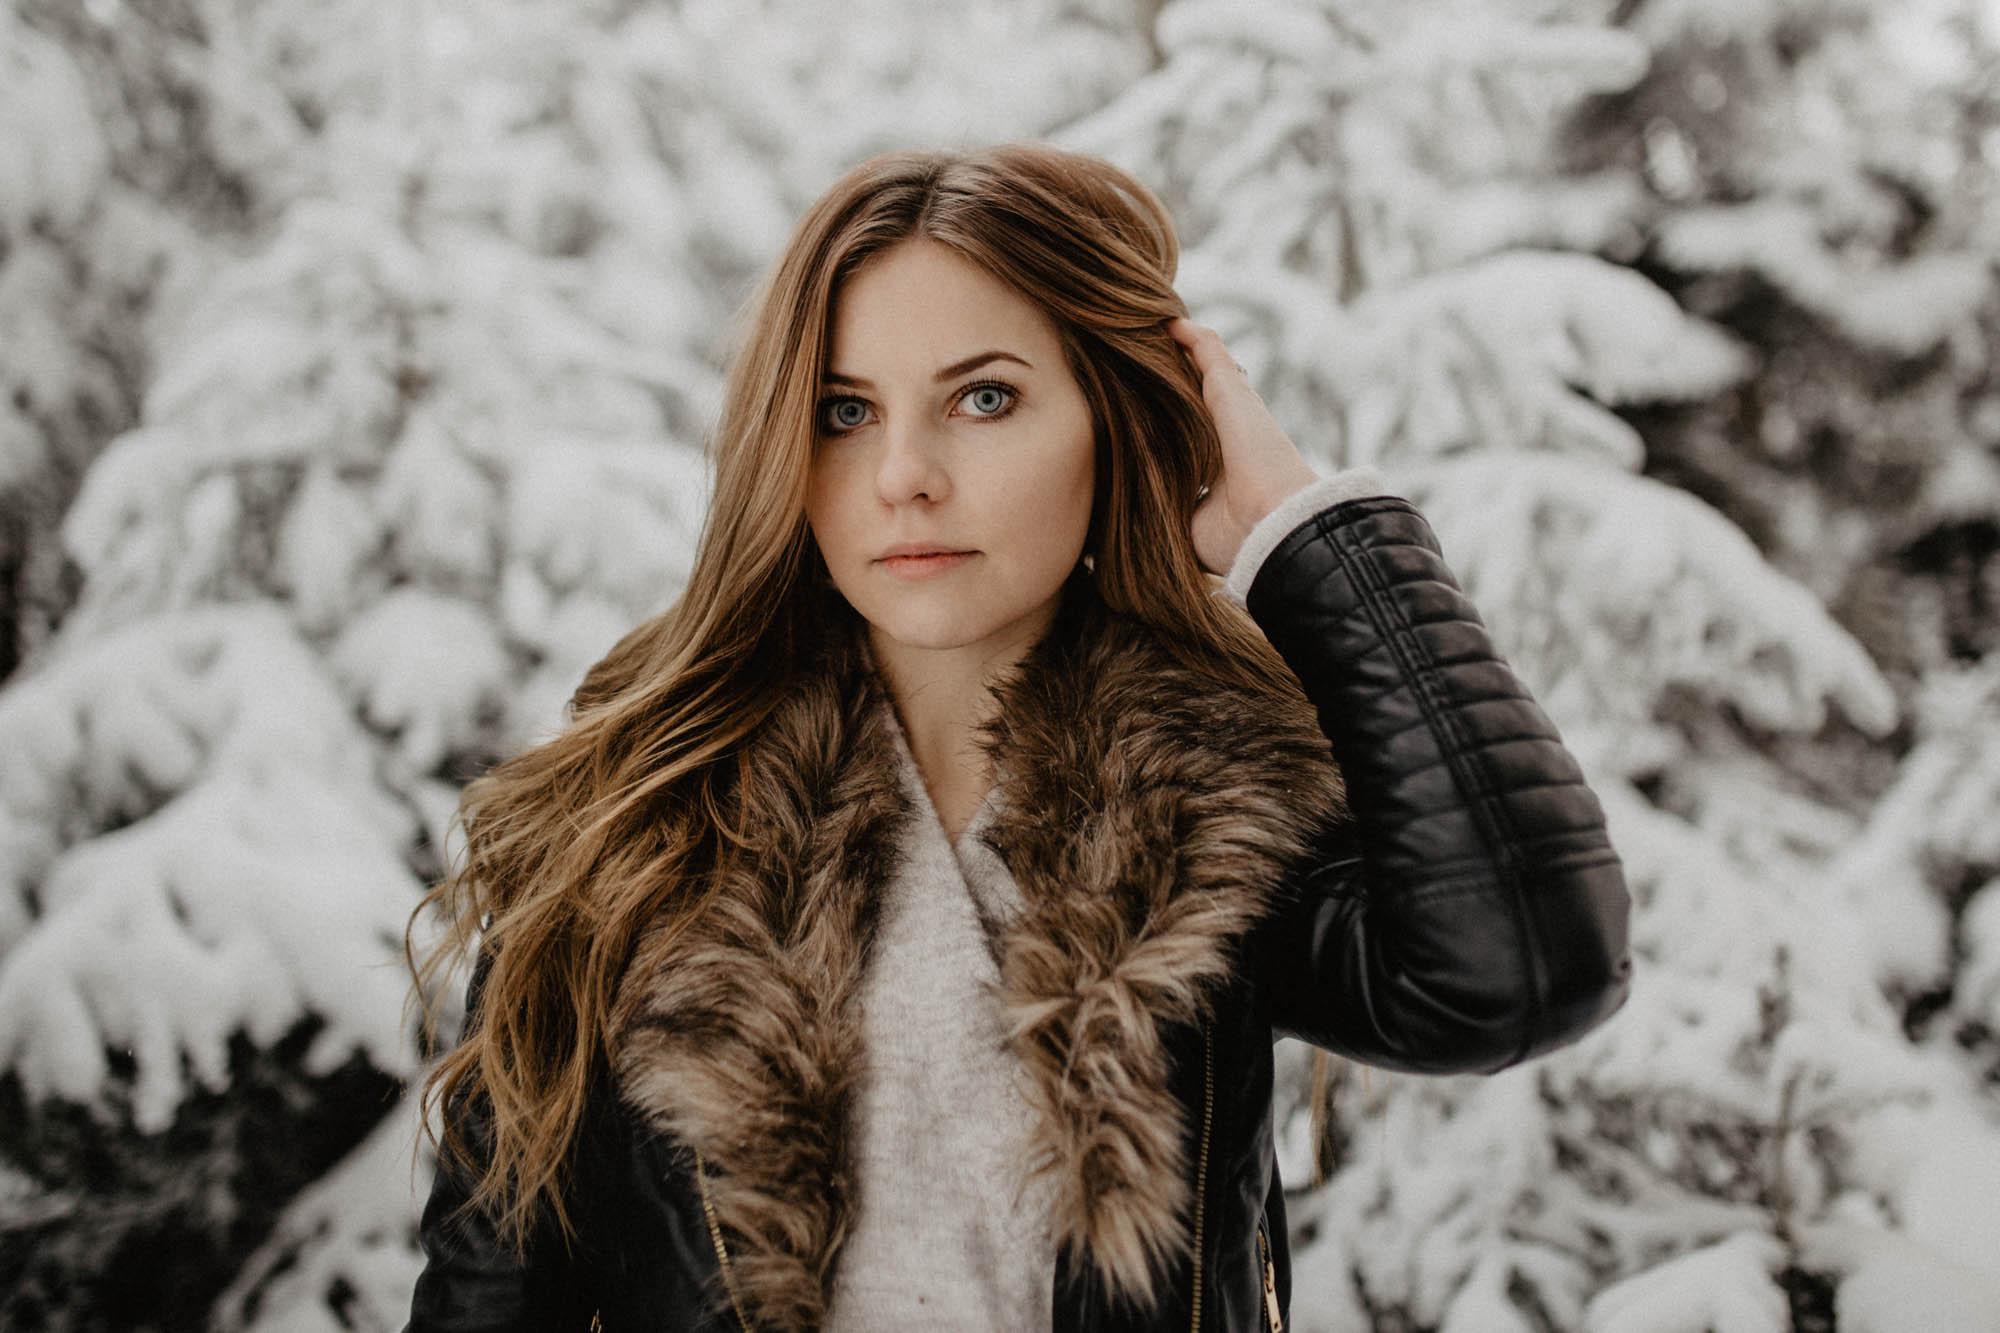 ashley_schulman_photography-winter_wedding_tampere-17.jpg